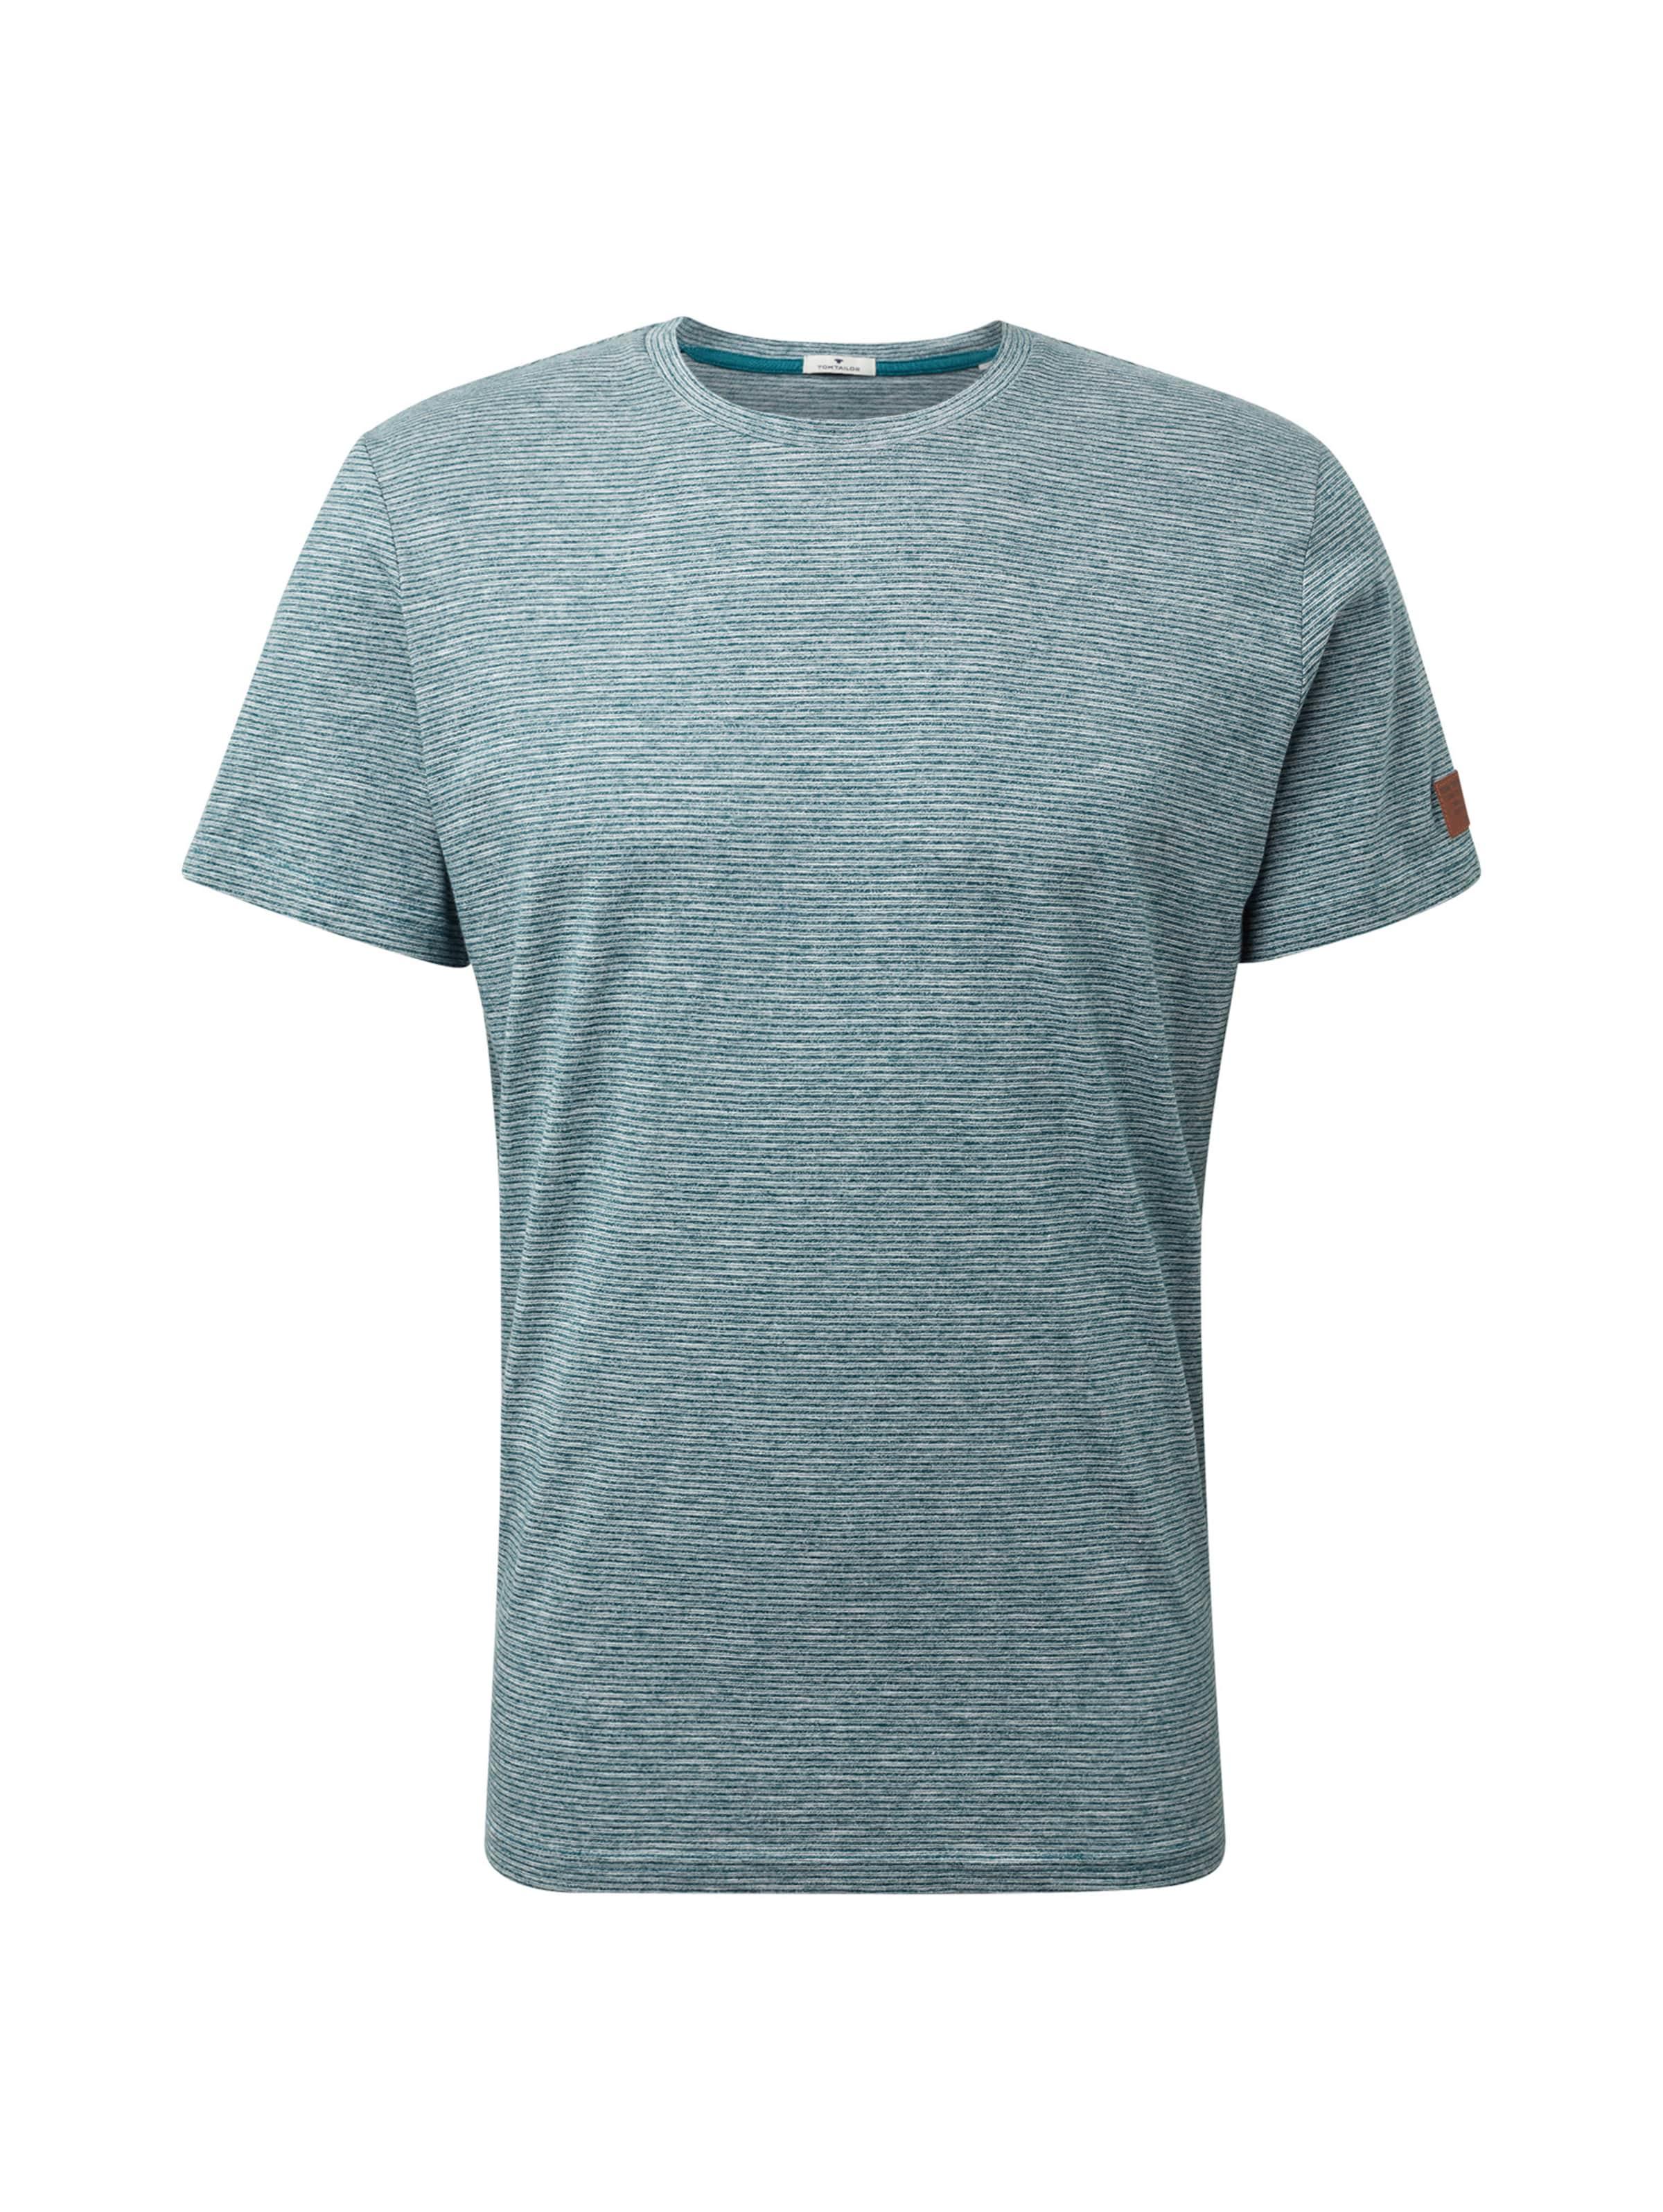 Tom In T HellblauWeiß Tailor shirt J3FKc1Tl